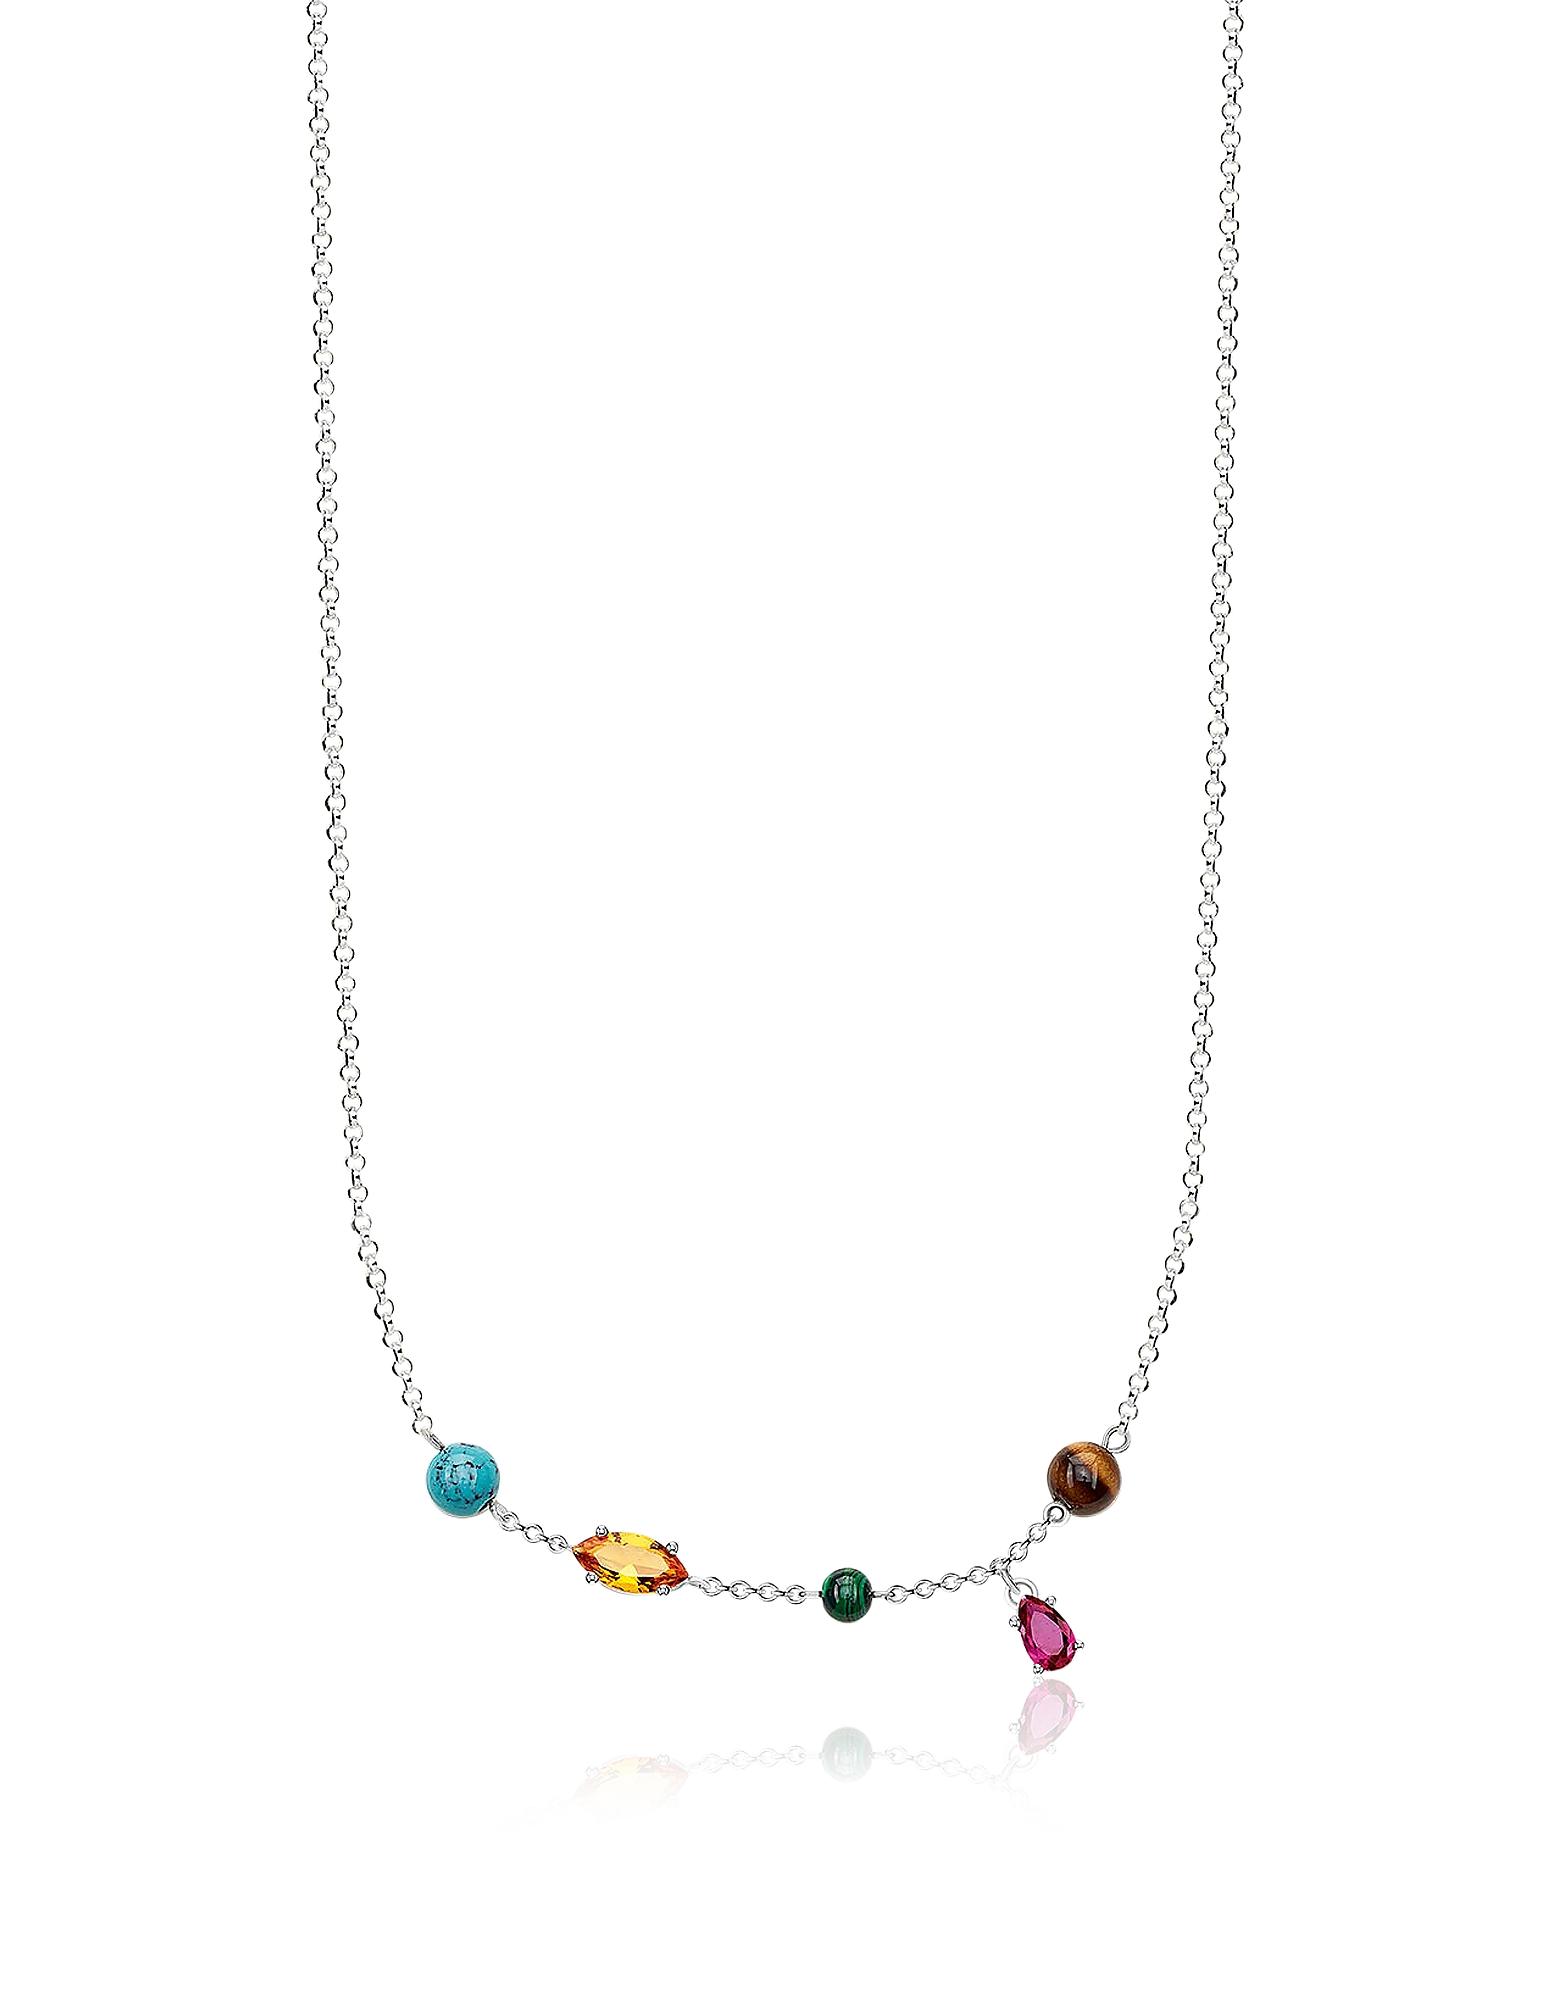 Thomas Sabo Necklaces, Sterling Silver Riviera Colours Necklace w/Ceramic Stones